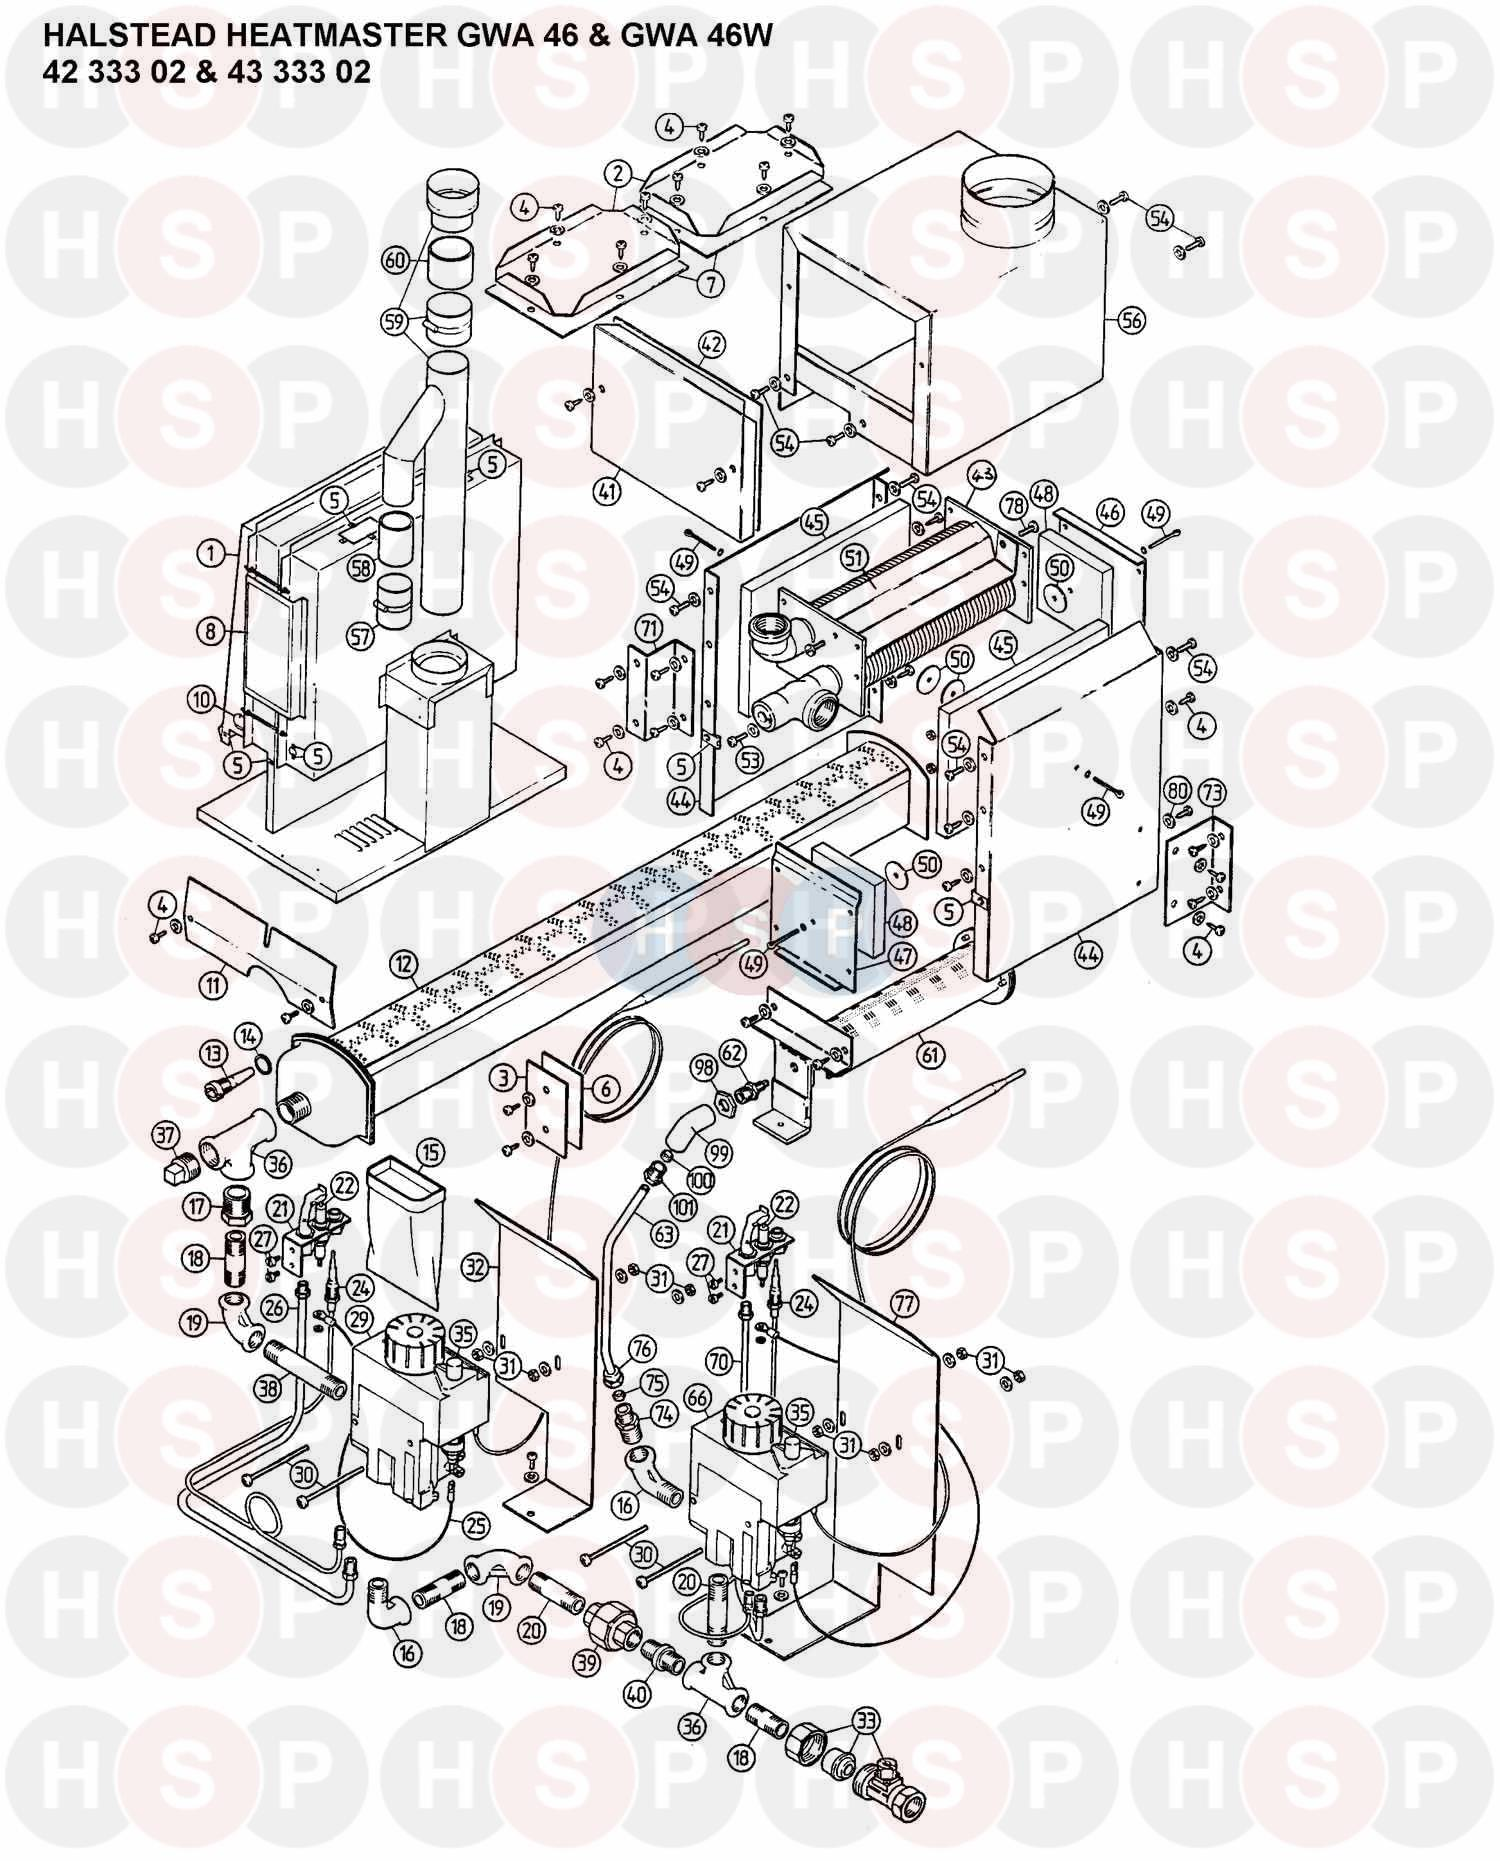 Halstead HEATMASTER GWA46W (HEATER ASSEMBLY) Diagram